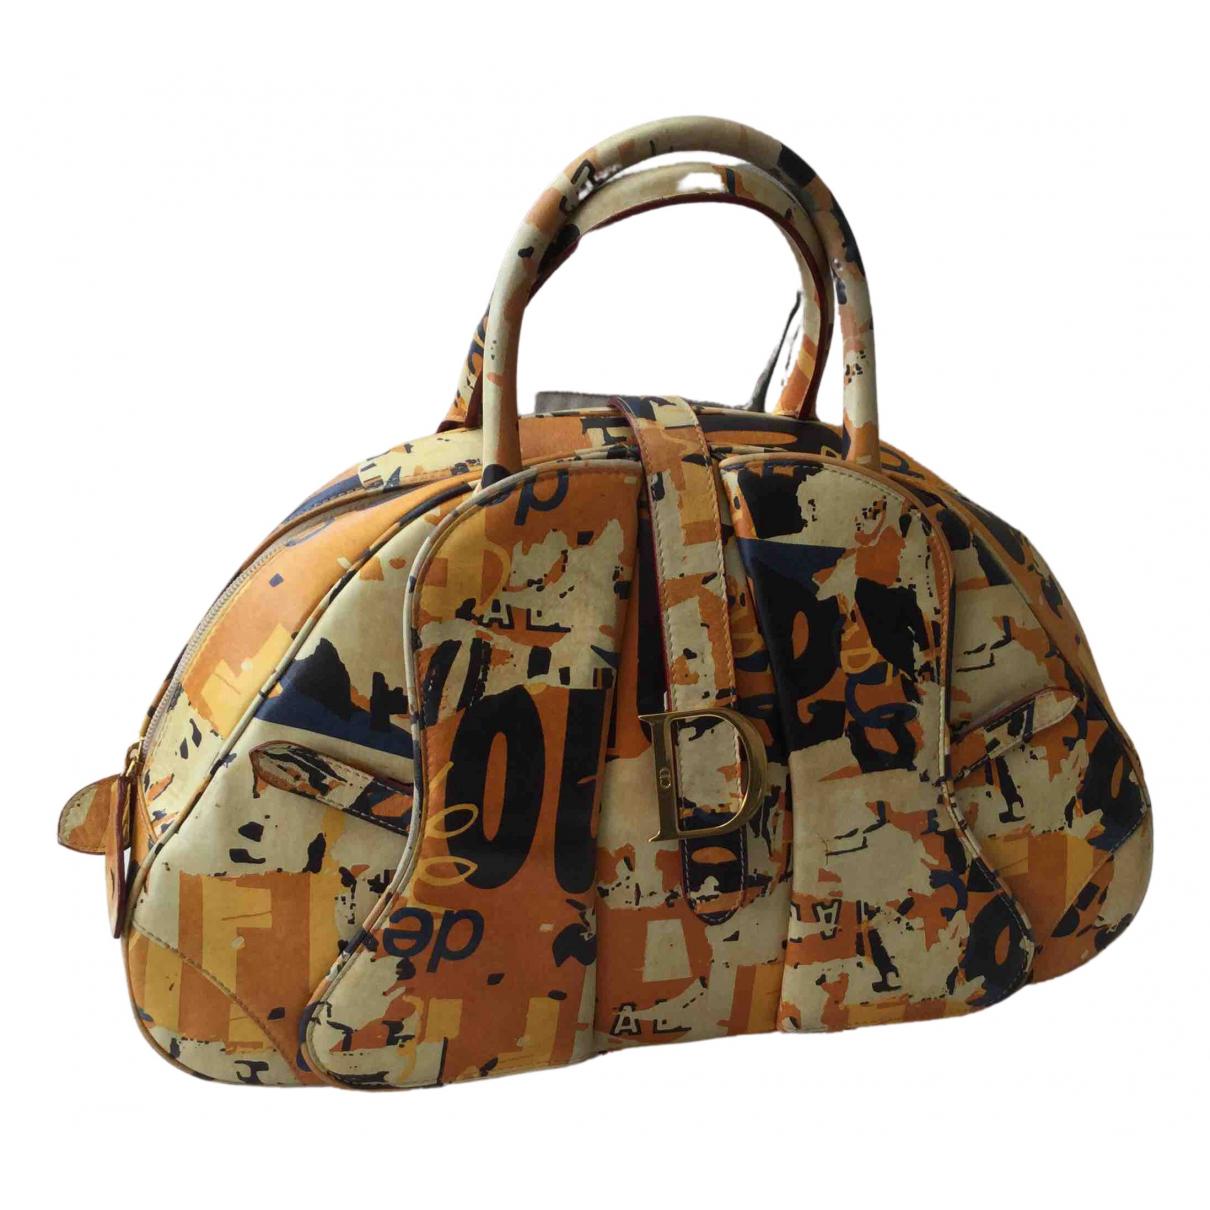 Dior Saddle Bowler Orange Leather handbag for Women N